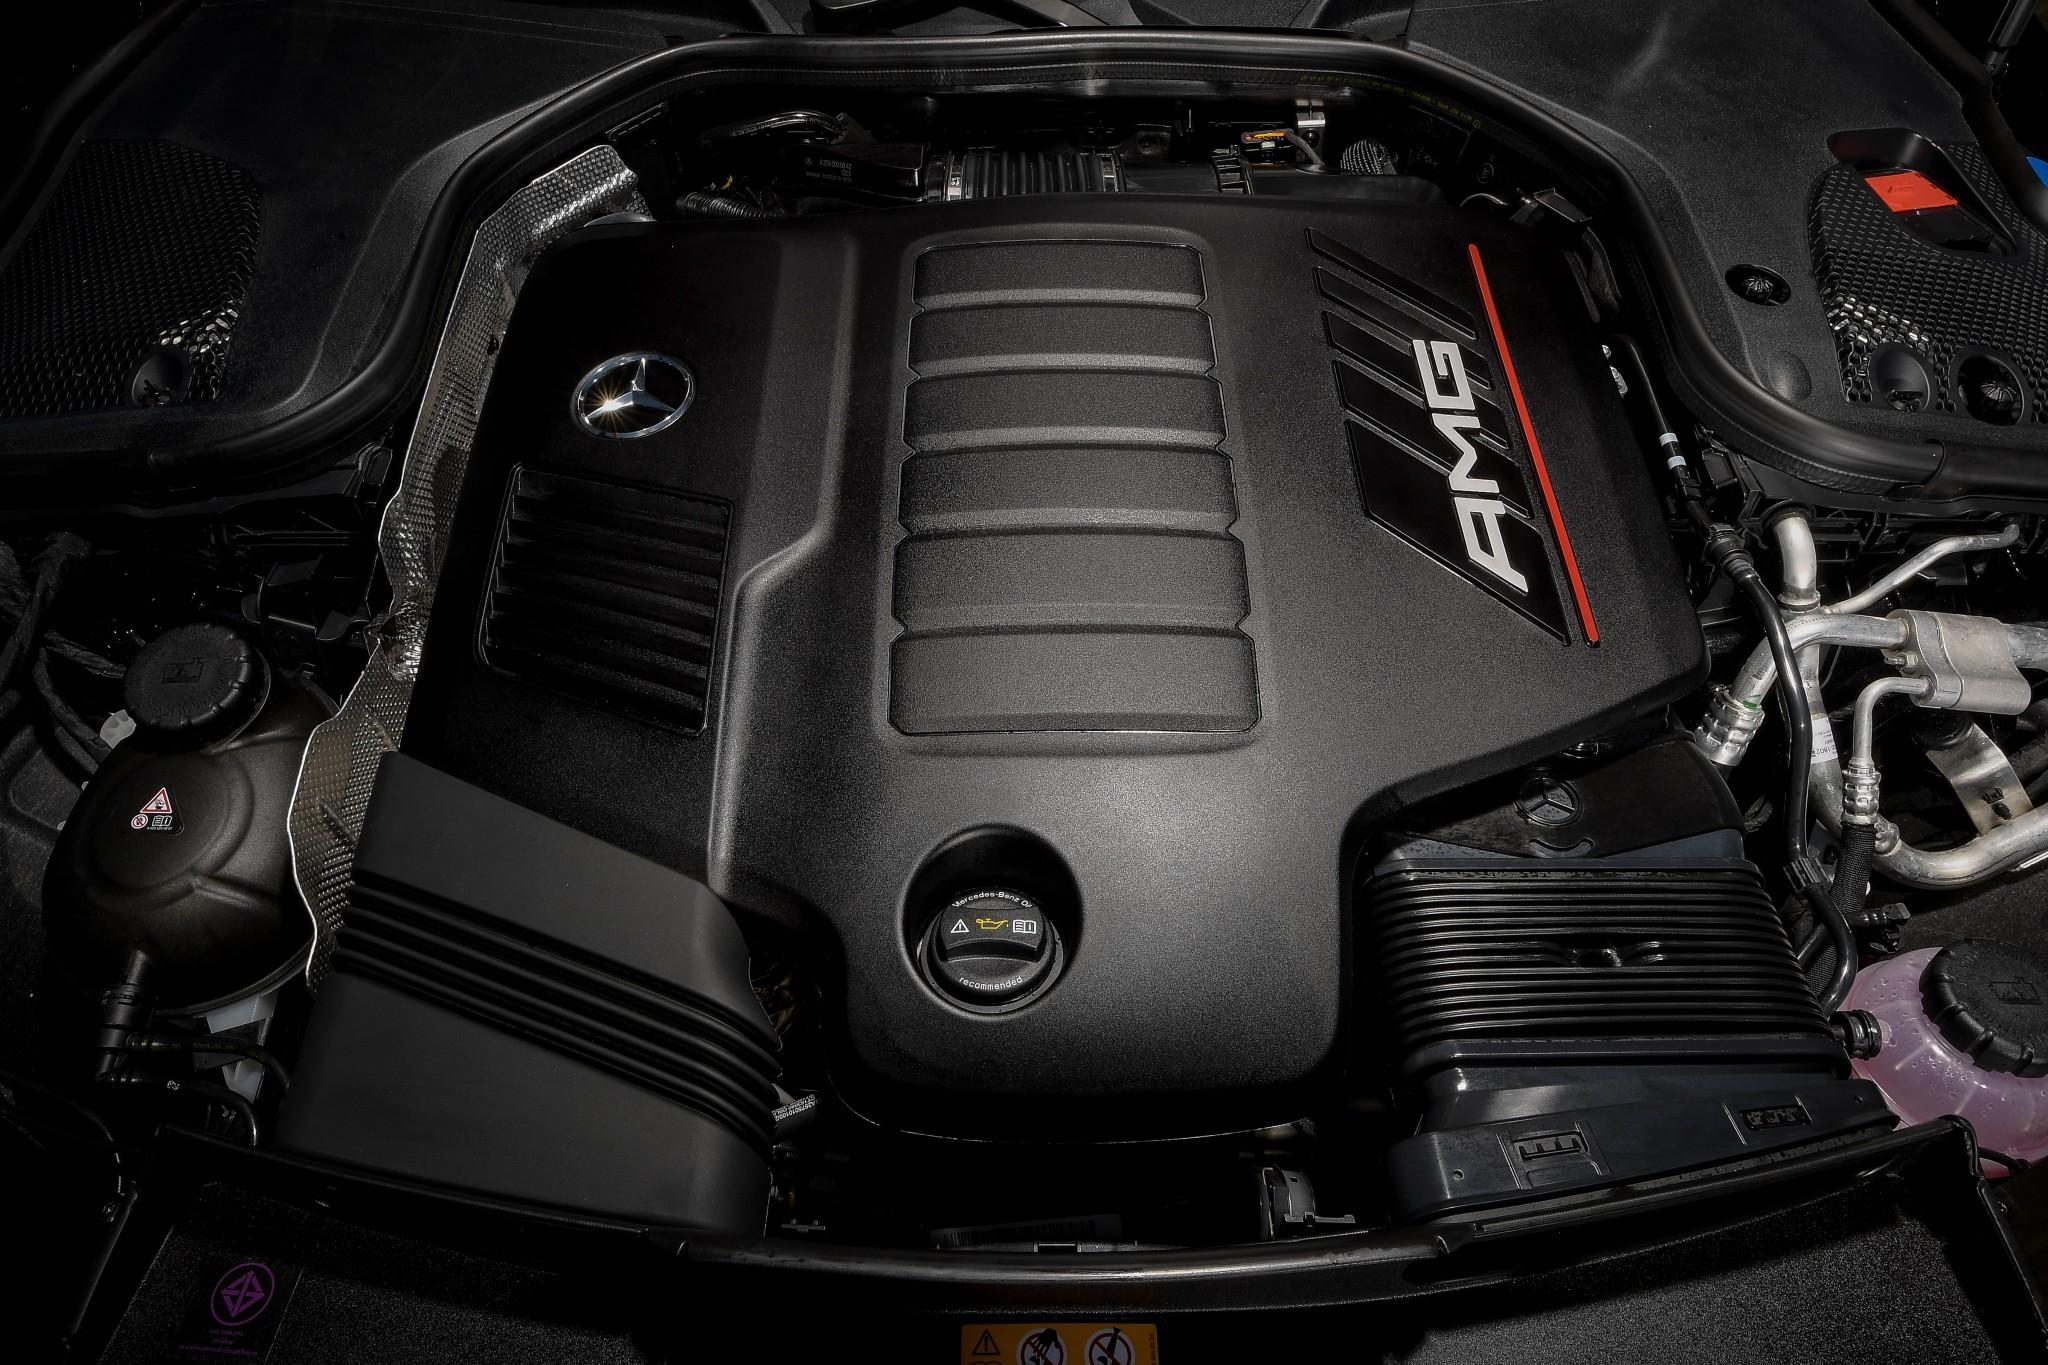 Mercedes-AMG GT 53 4MATIC+ 4-Door Coupe (Exterior) (9)